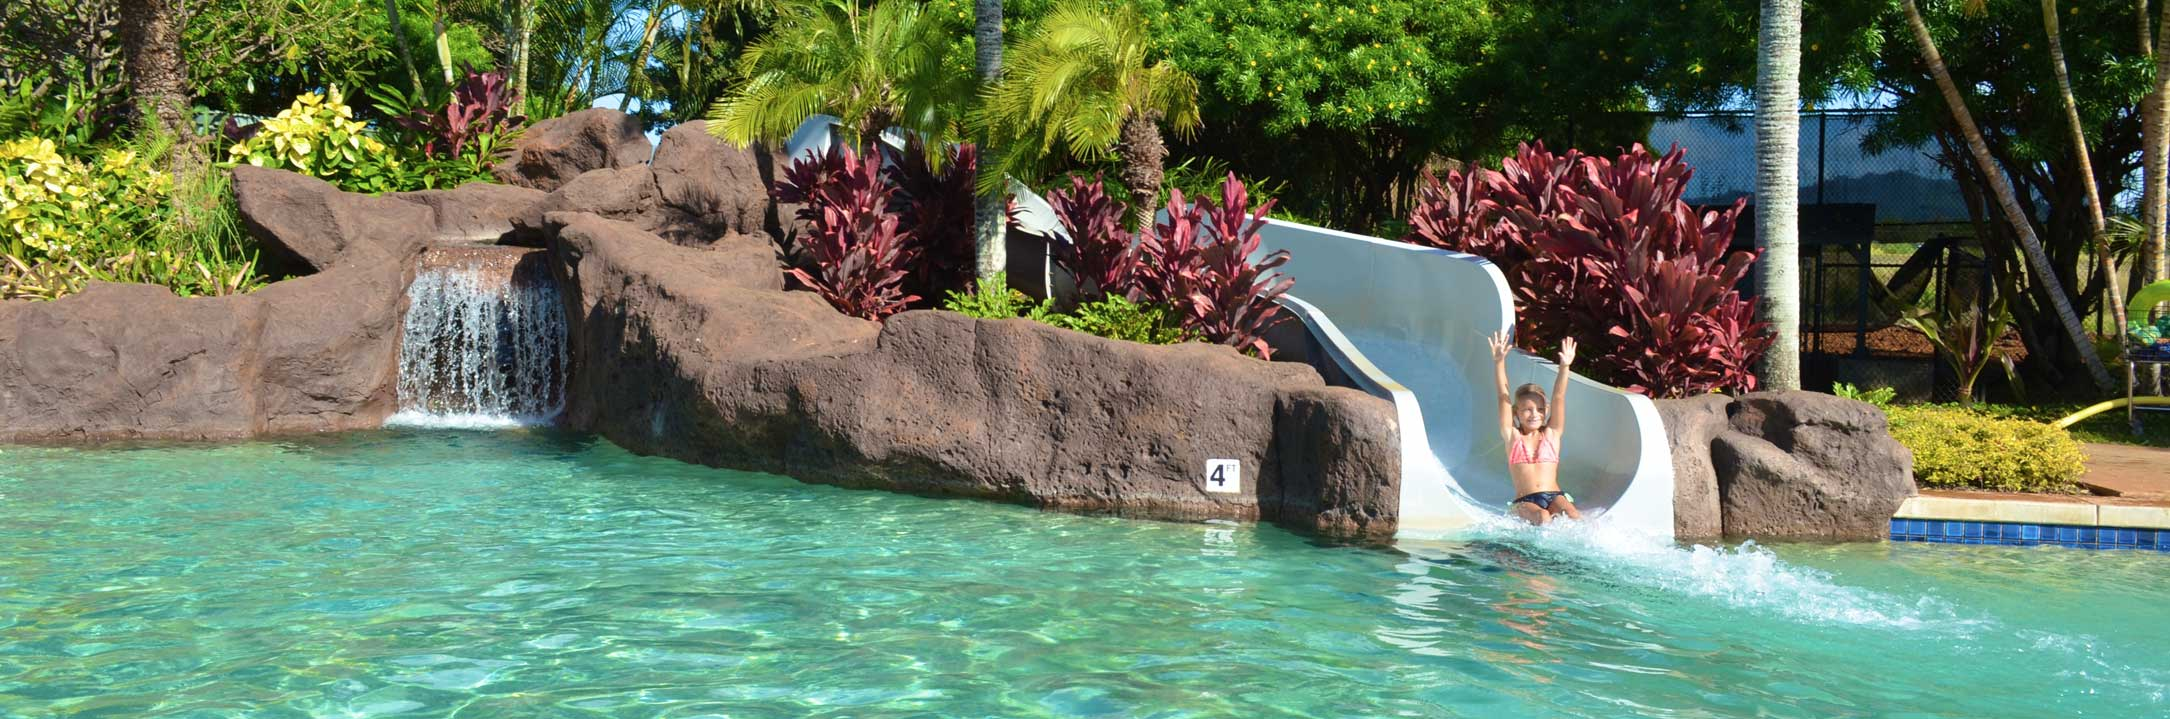 pbac-pool-slide-w